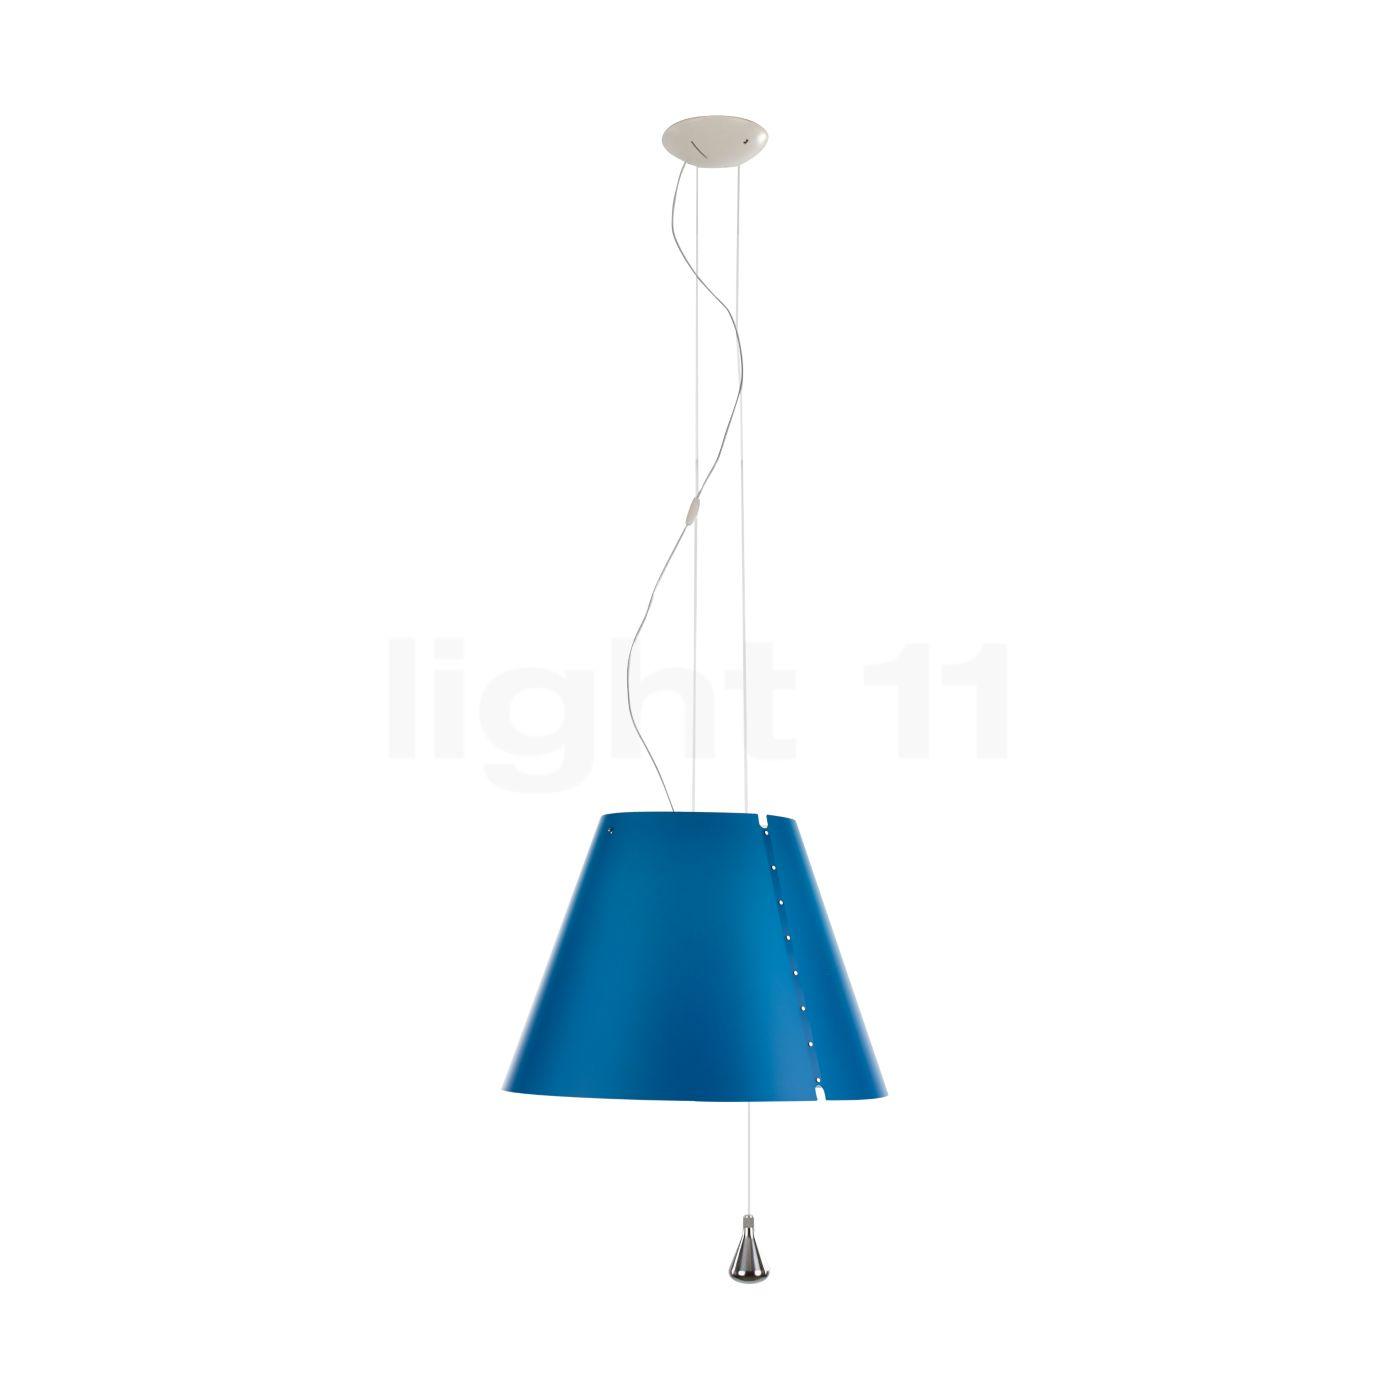 Luceplan Costanza Sospensione LED à coulisse, bleu pétrole